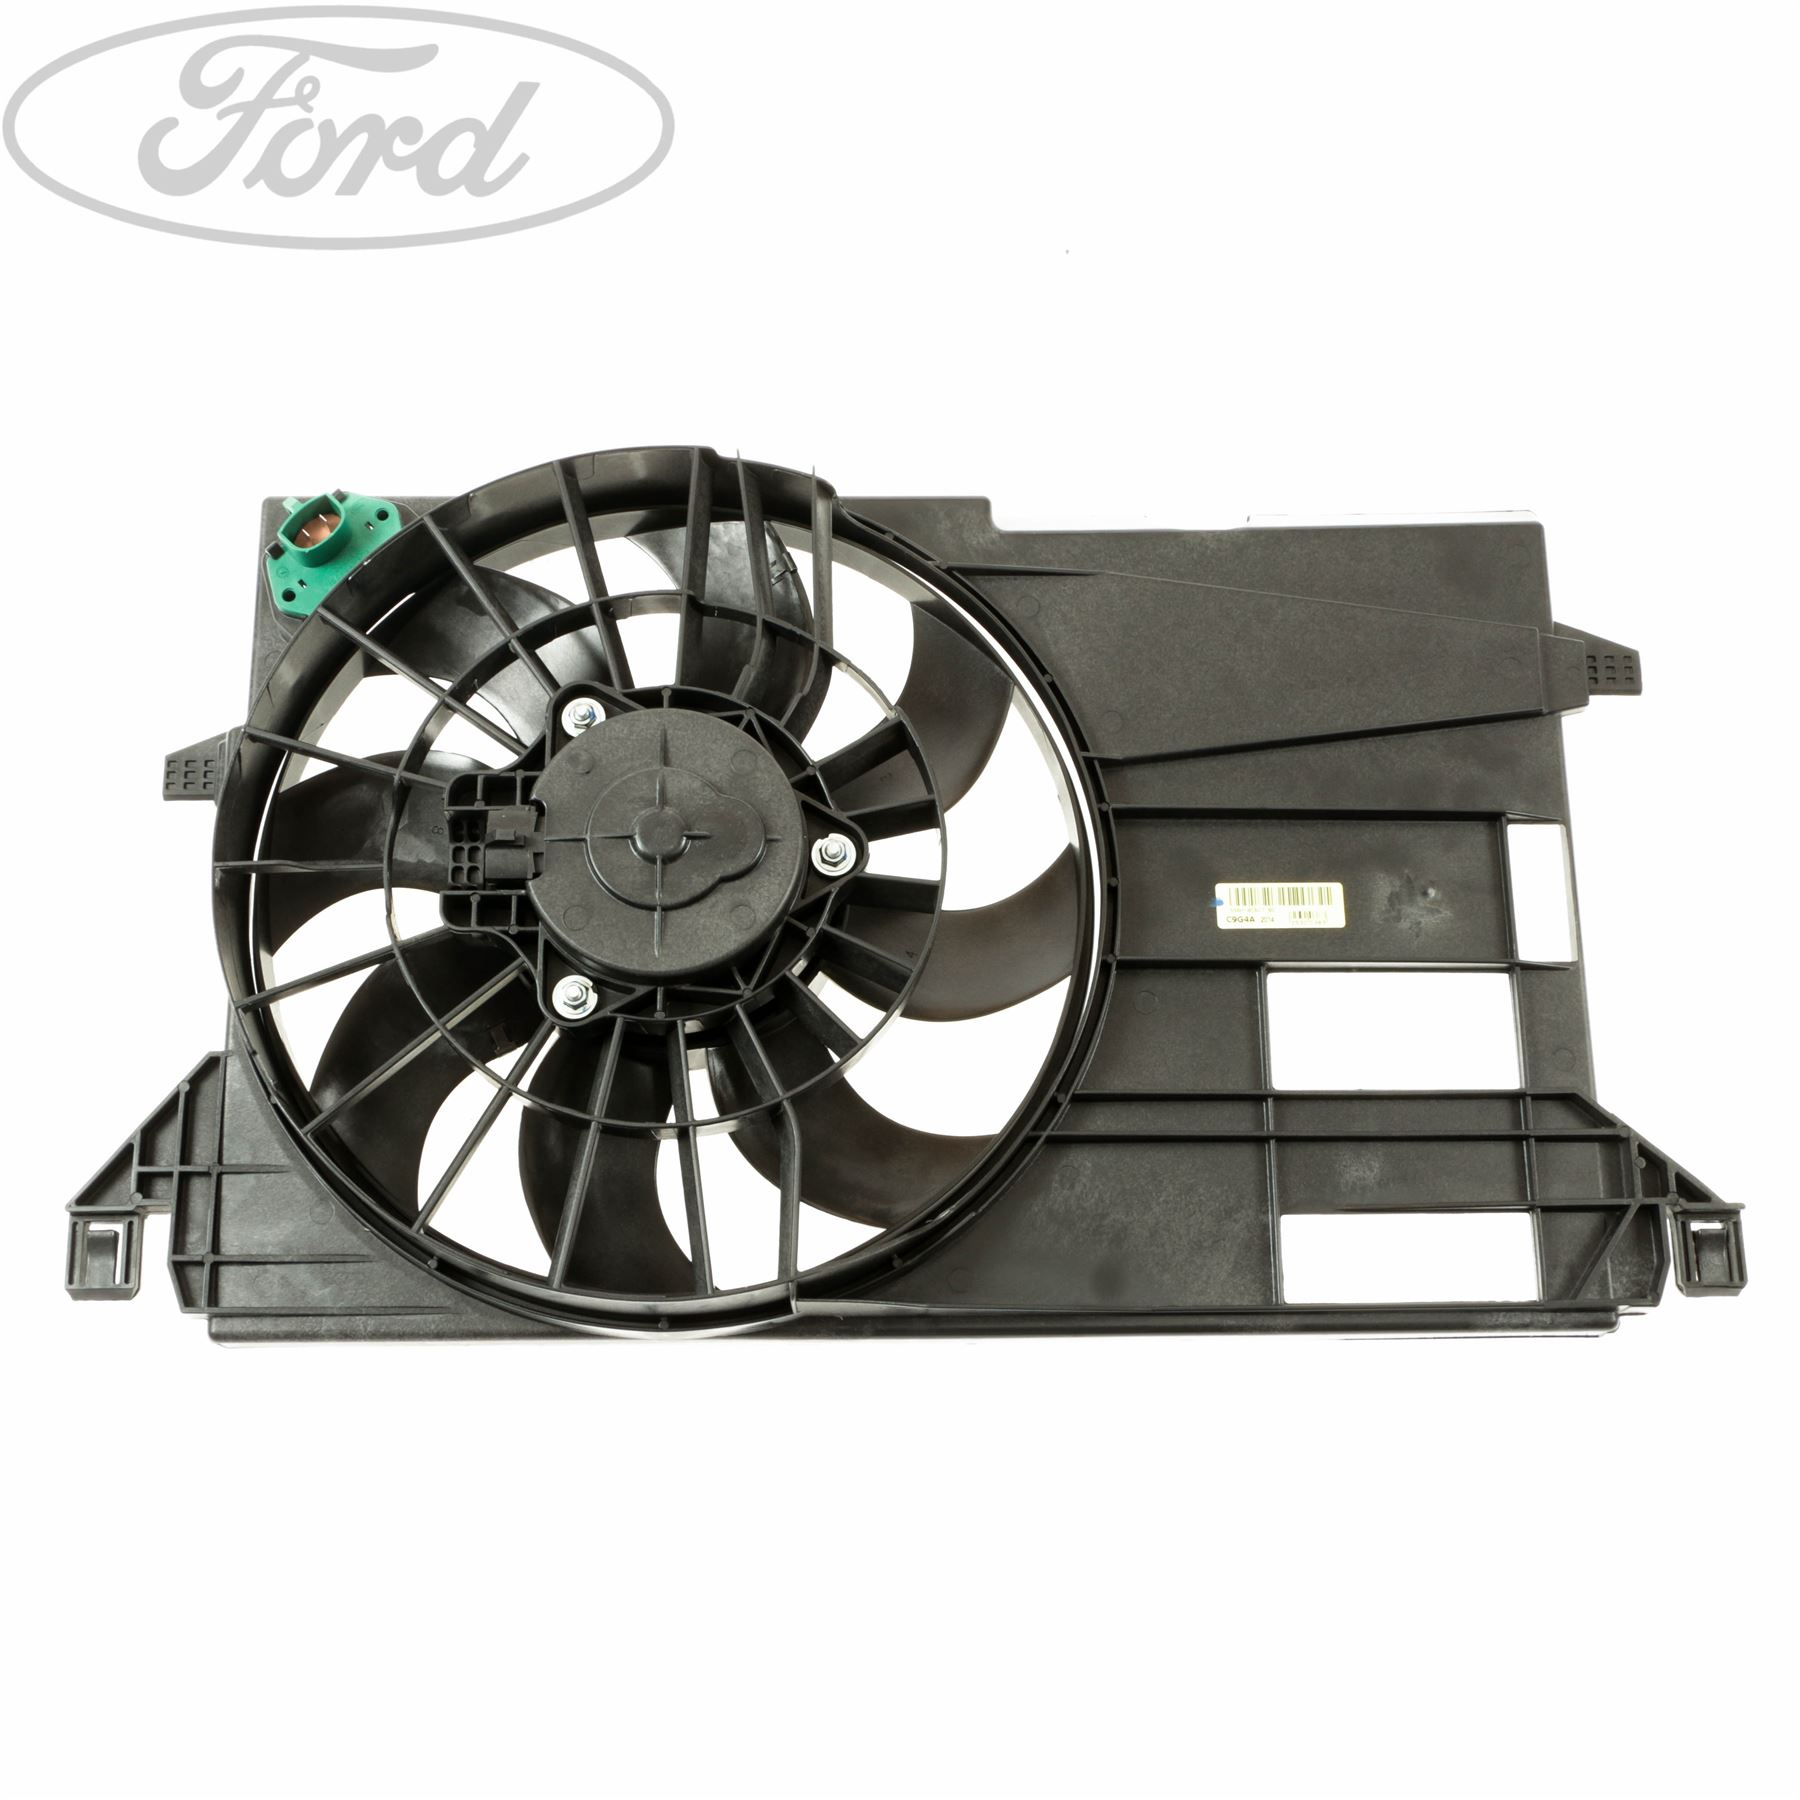 genuine ford fiesta mk6 fusion 1 6 tdci radiator fan. Black Bedroom Furniture Sets. Home Design Ideas